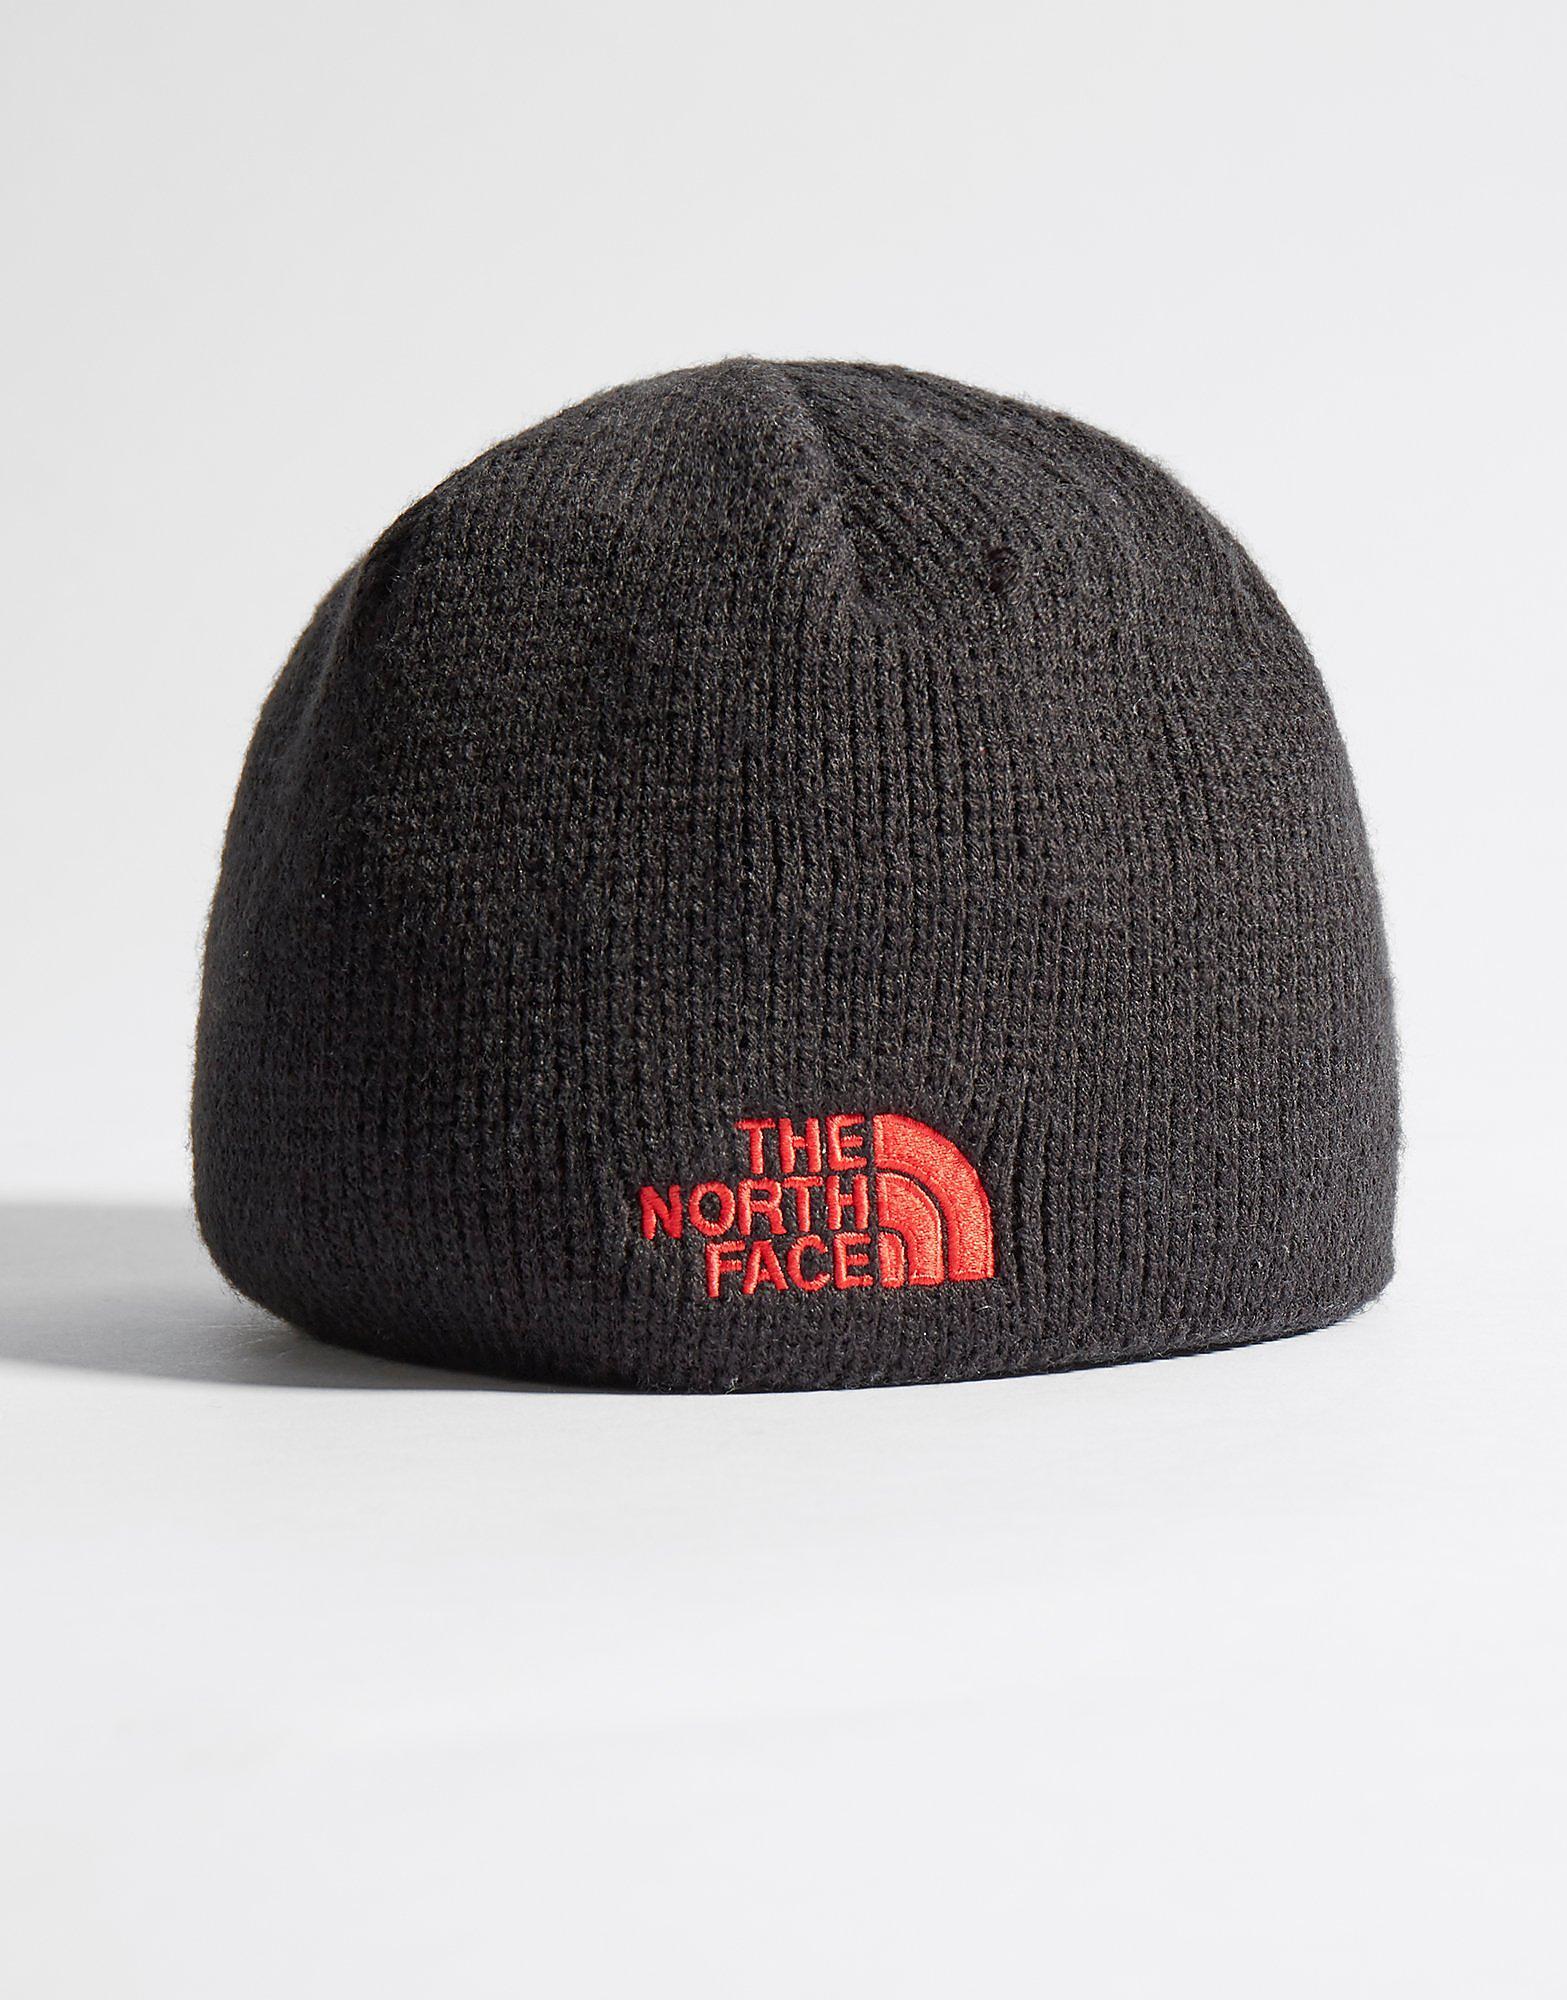 The North Face Bones beanie-hat